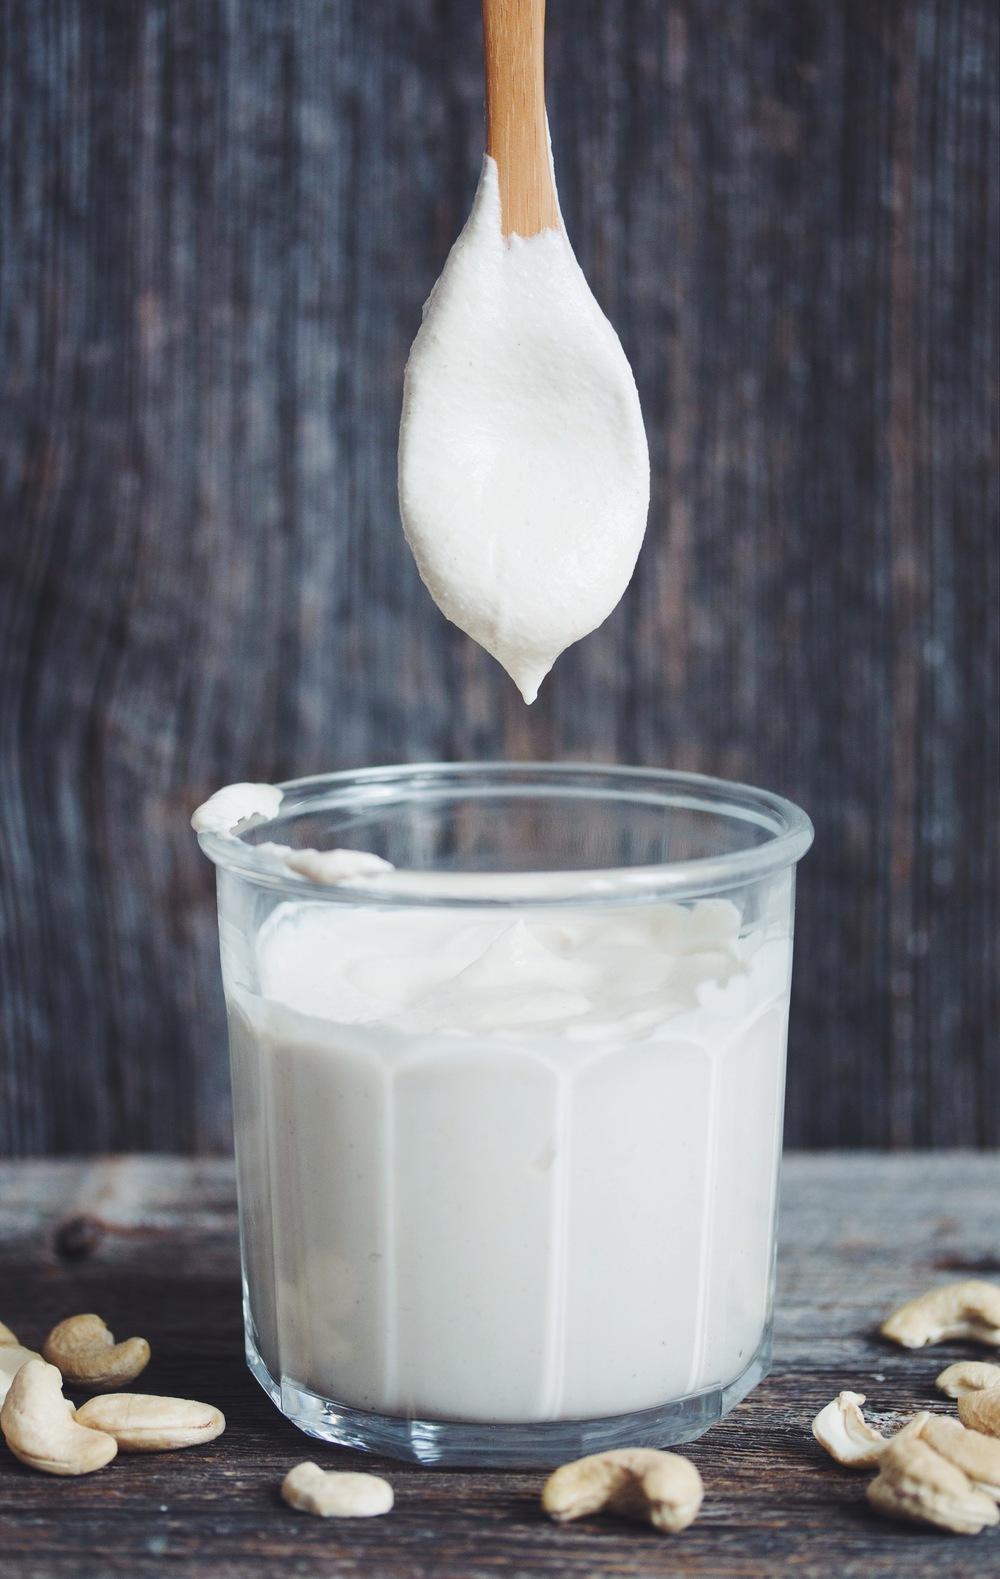 Cashew Sour Cream Hot For Food By Lauren Toyota Recipe In 2020 Cashew Sour Cream Vegan Sour Cream Vegan Condiments